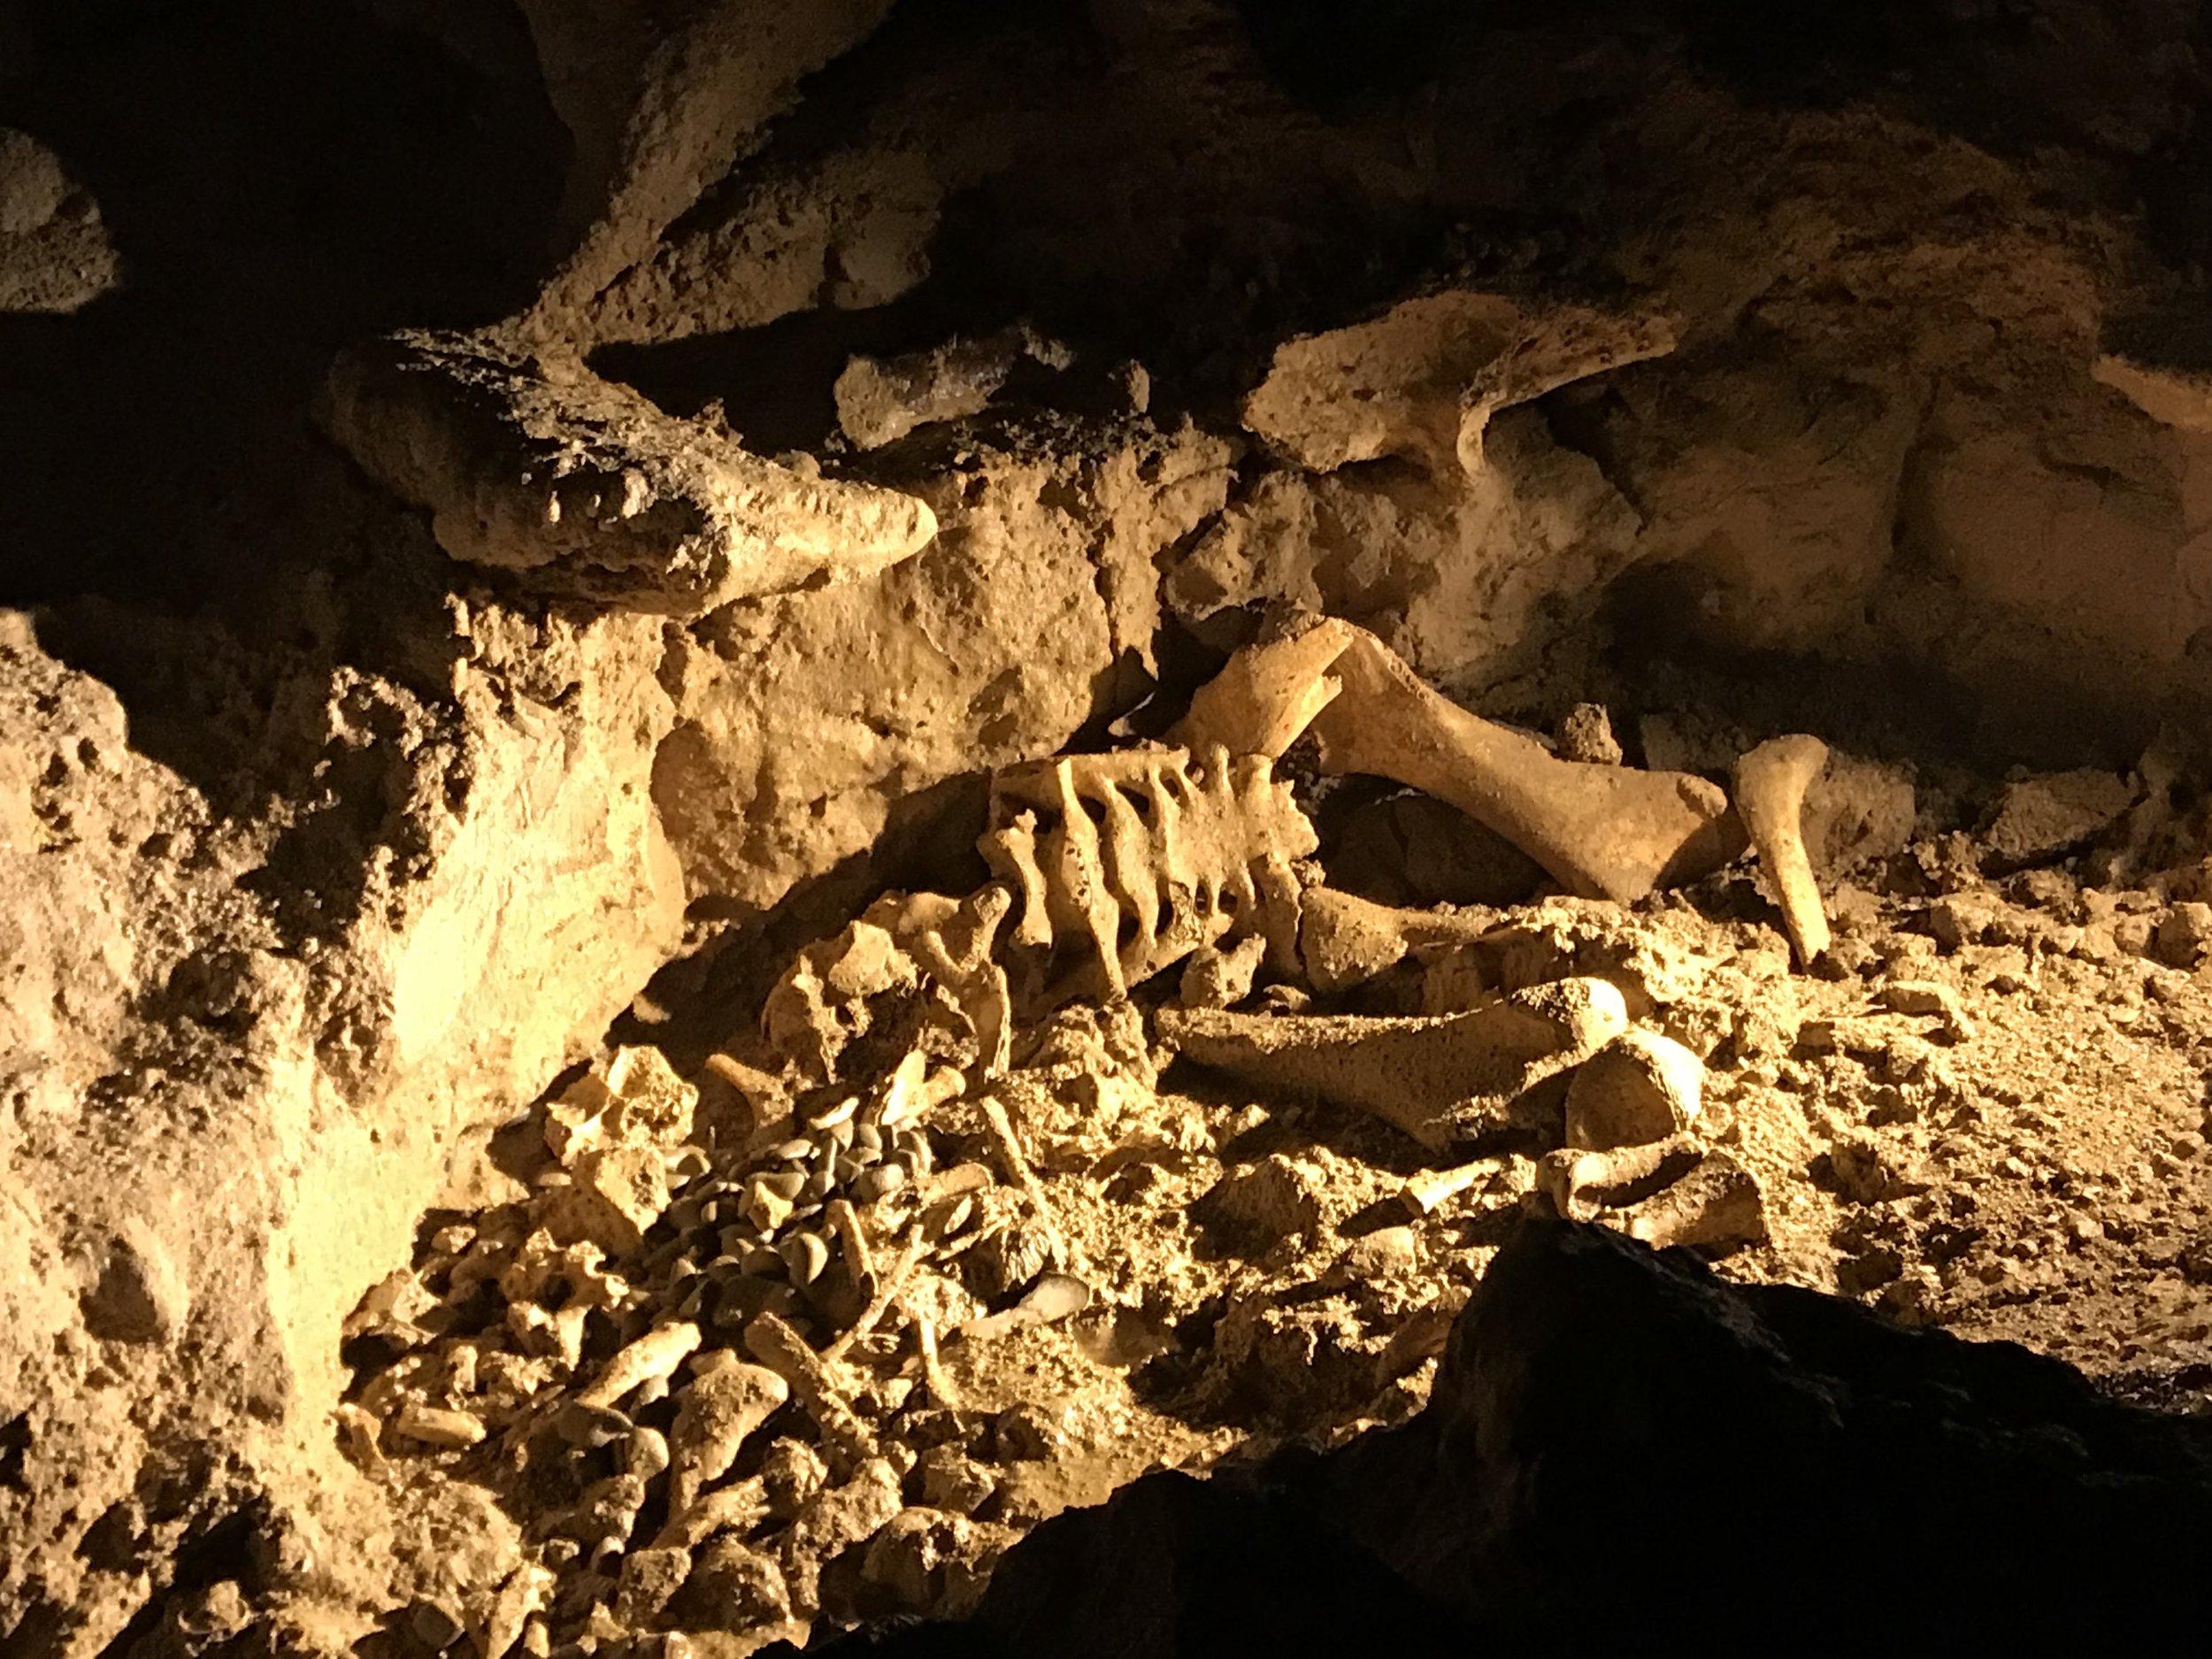 Kiwi skeleton in the glowworm cave